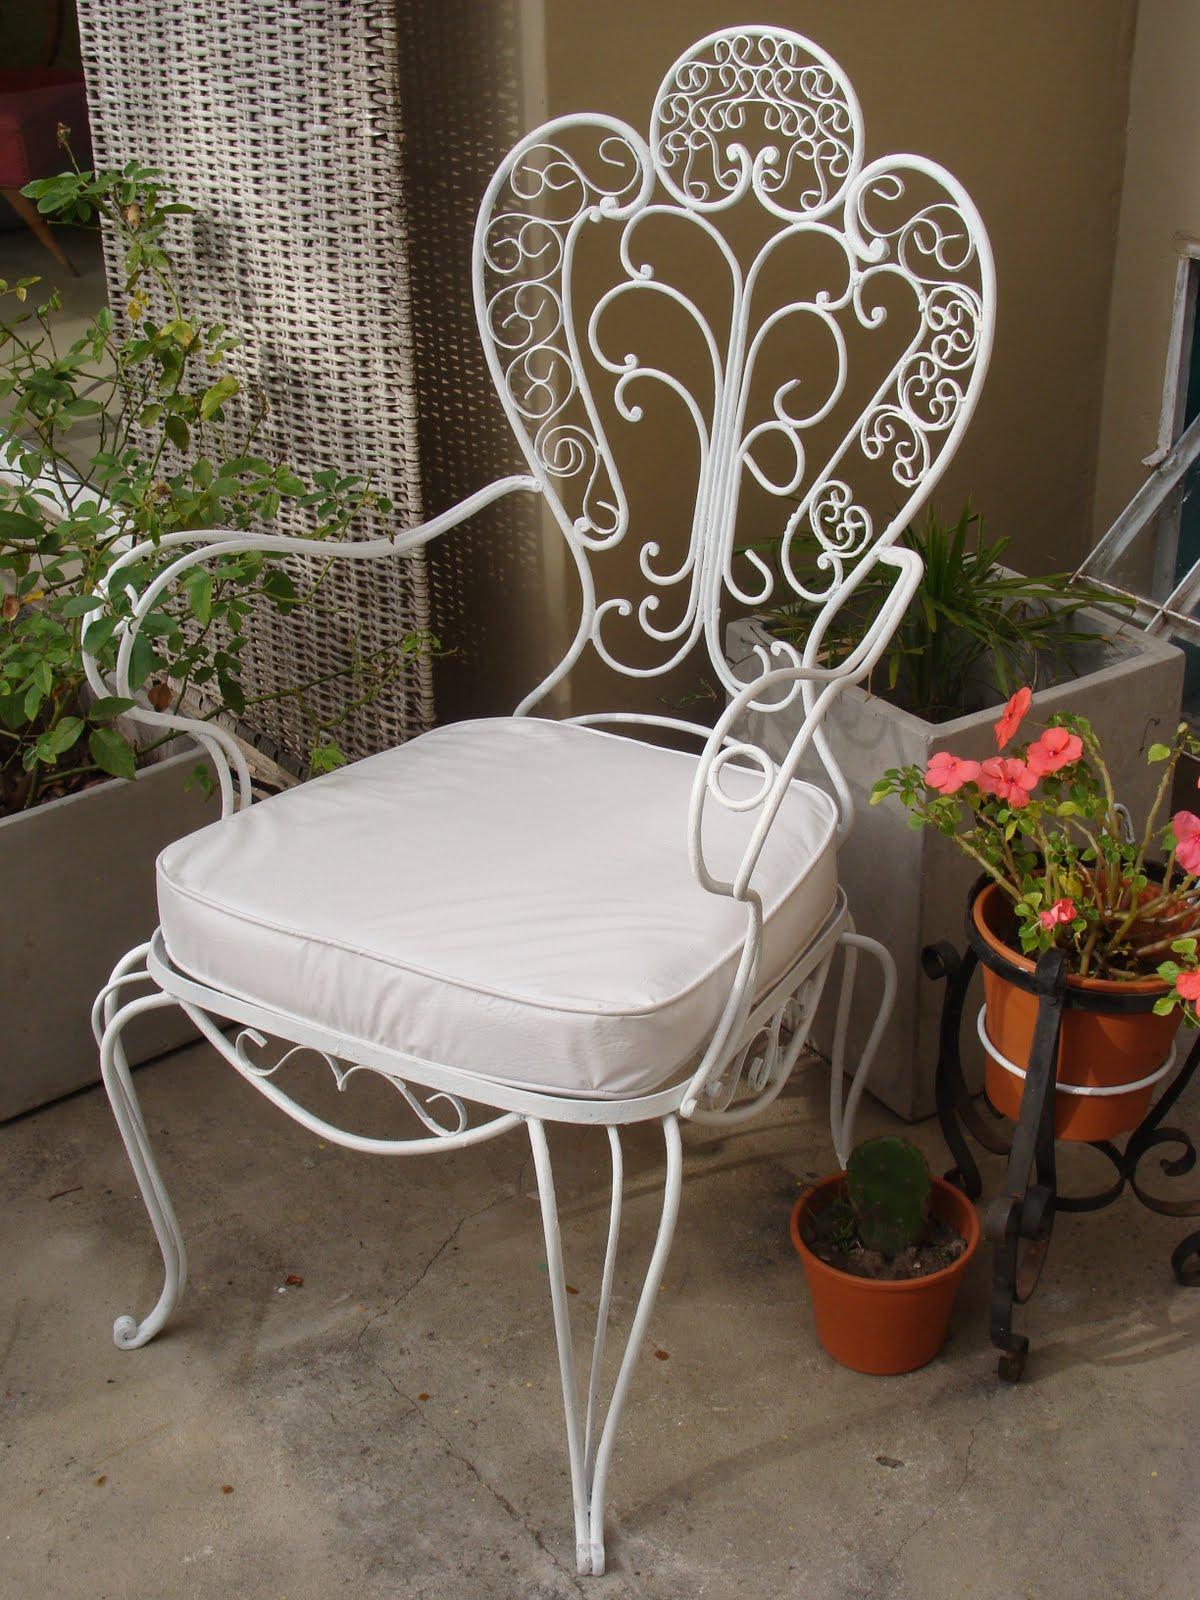 So glittering la silla de hierro forjado for Mecedoras para jardin